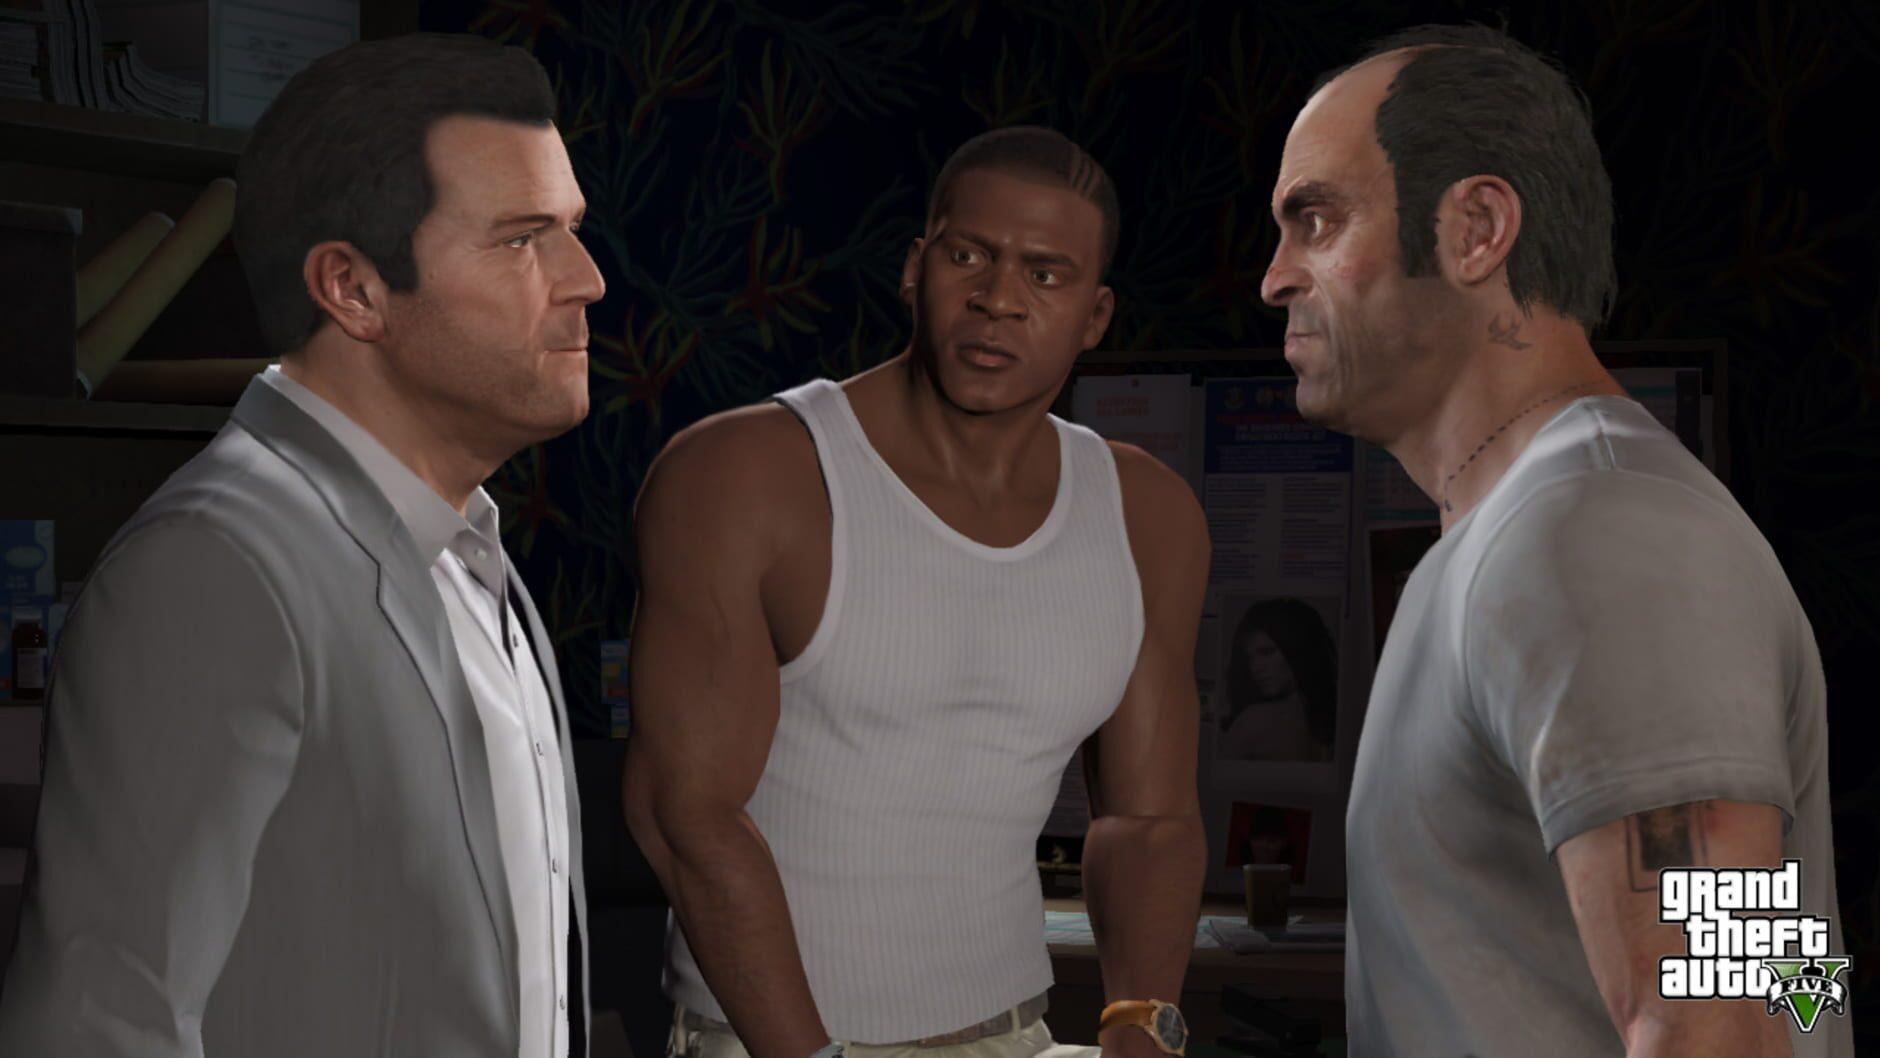 Grand Theft Auto V - 3